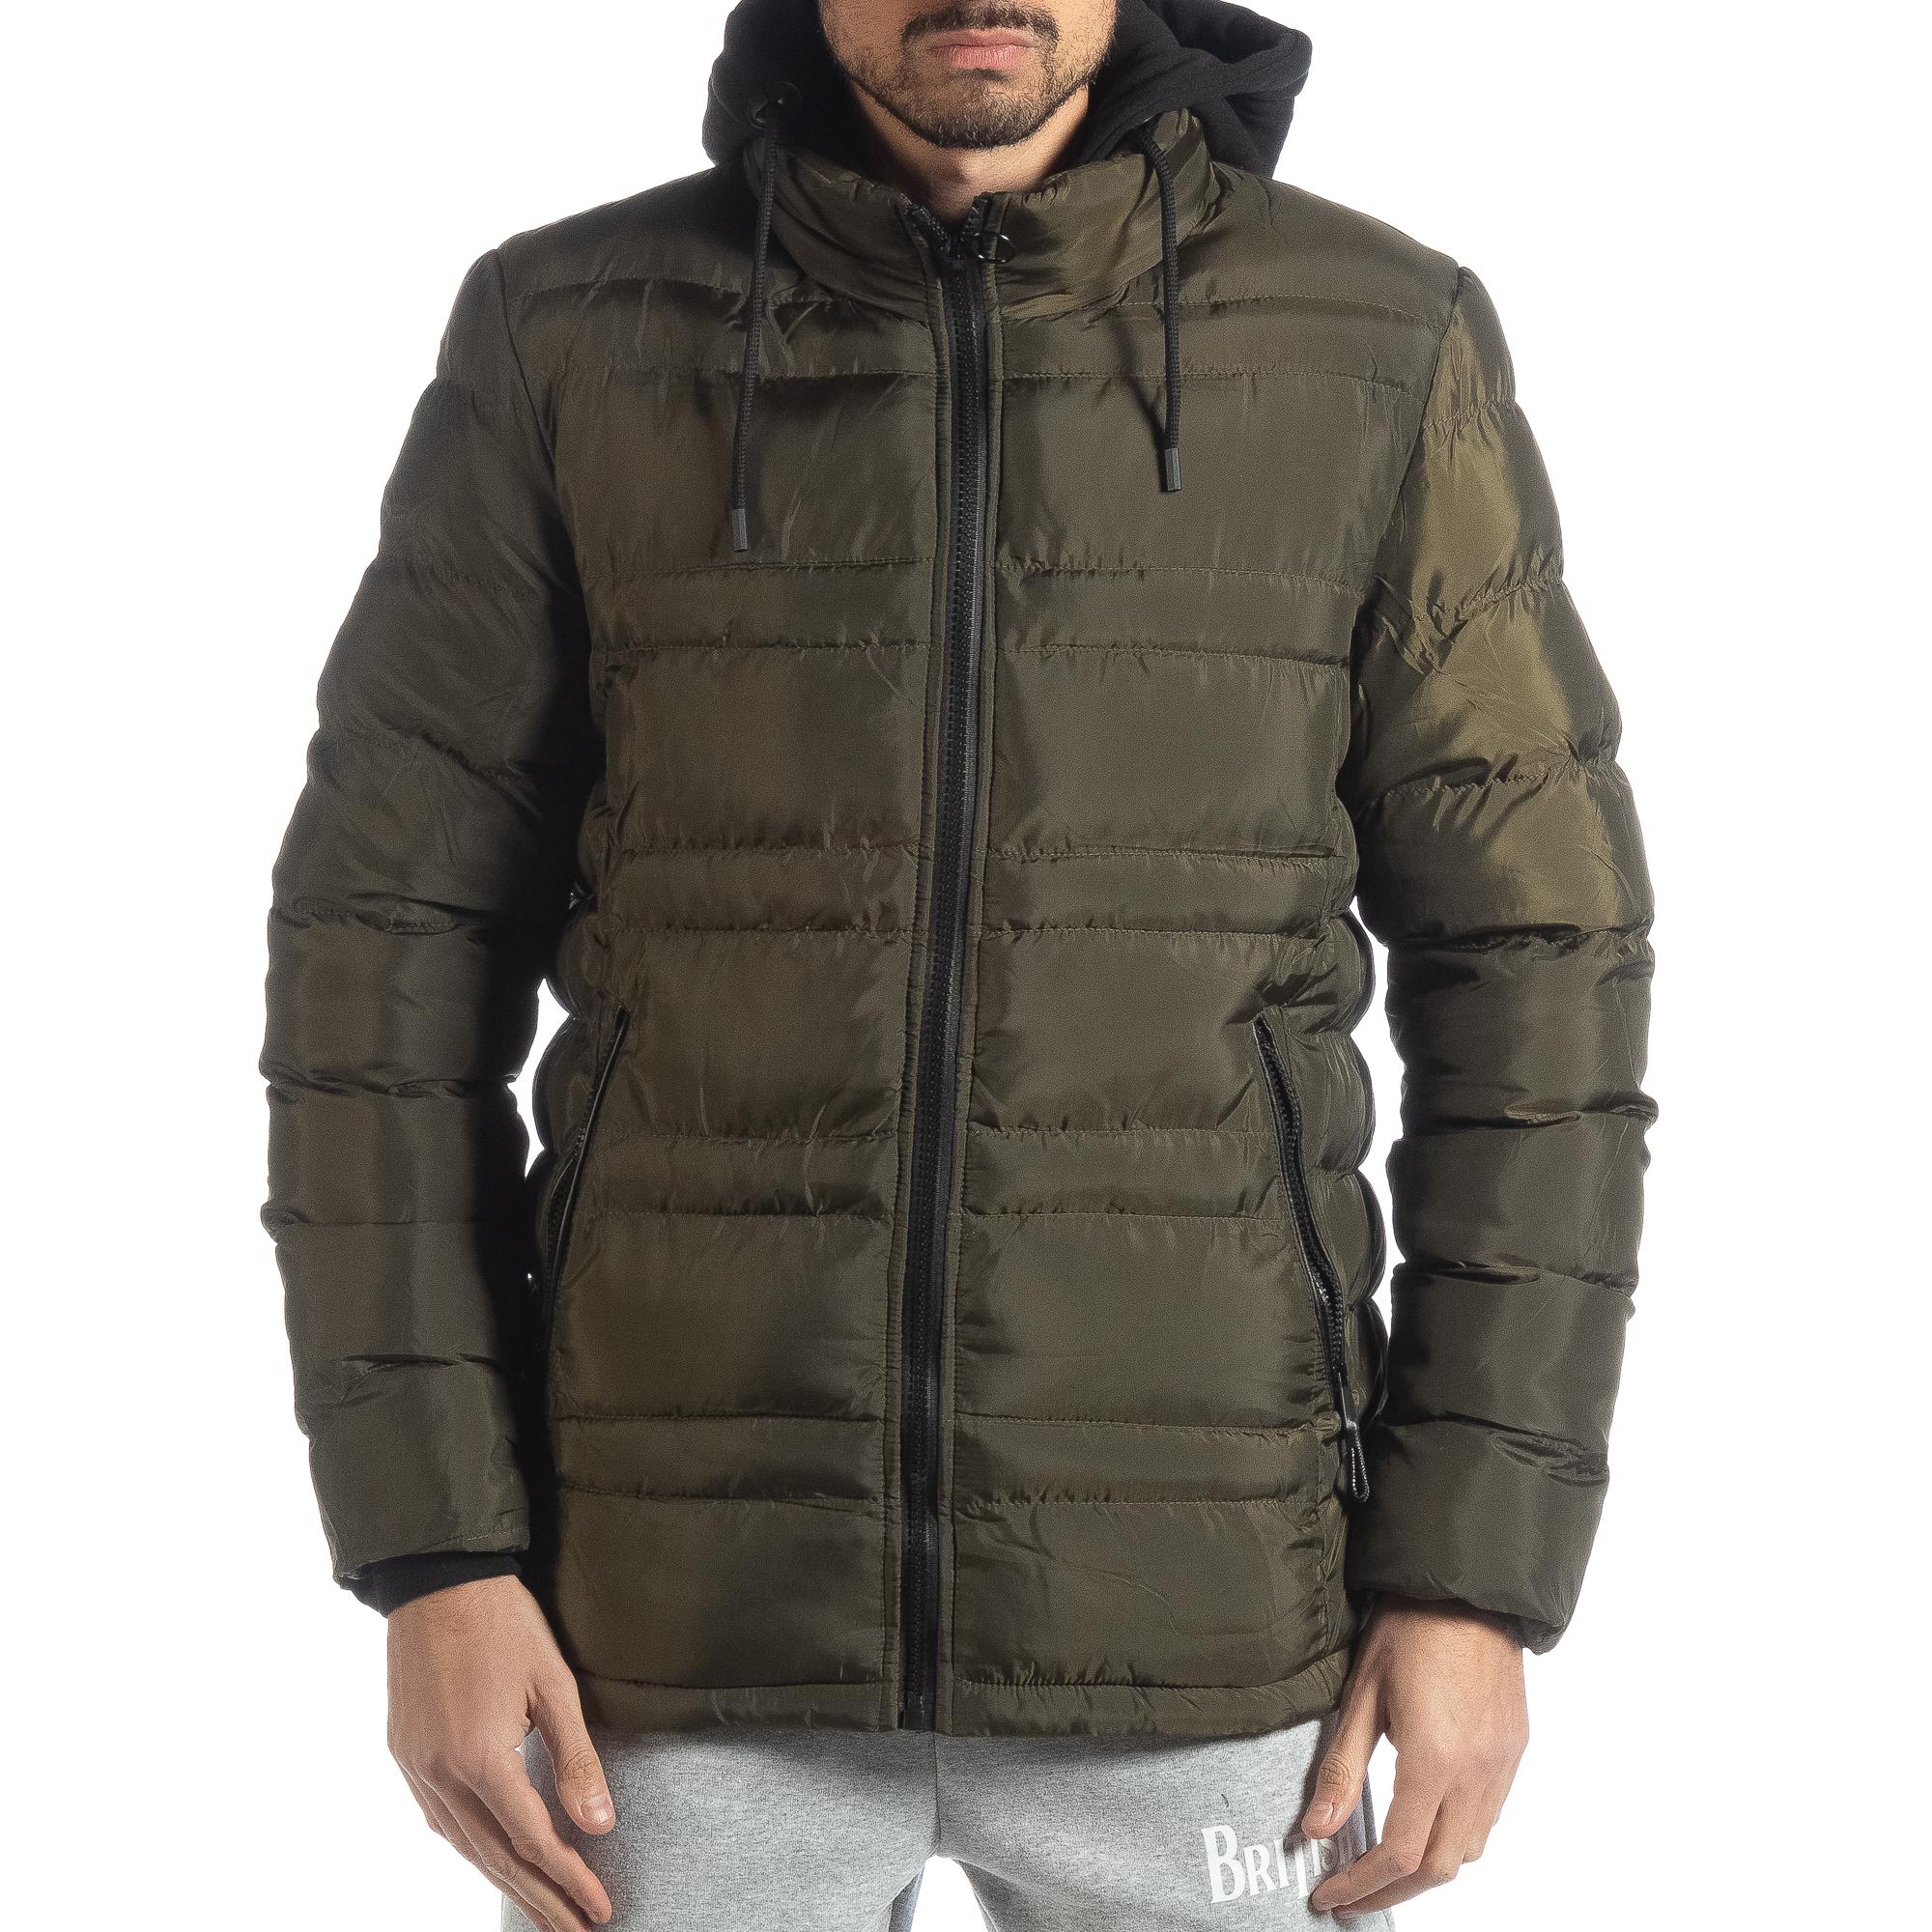 d4e5dccd1cf Ανδρικό χειμερινό μπουφάν με κουκούλα σε χρώμα military